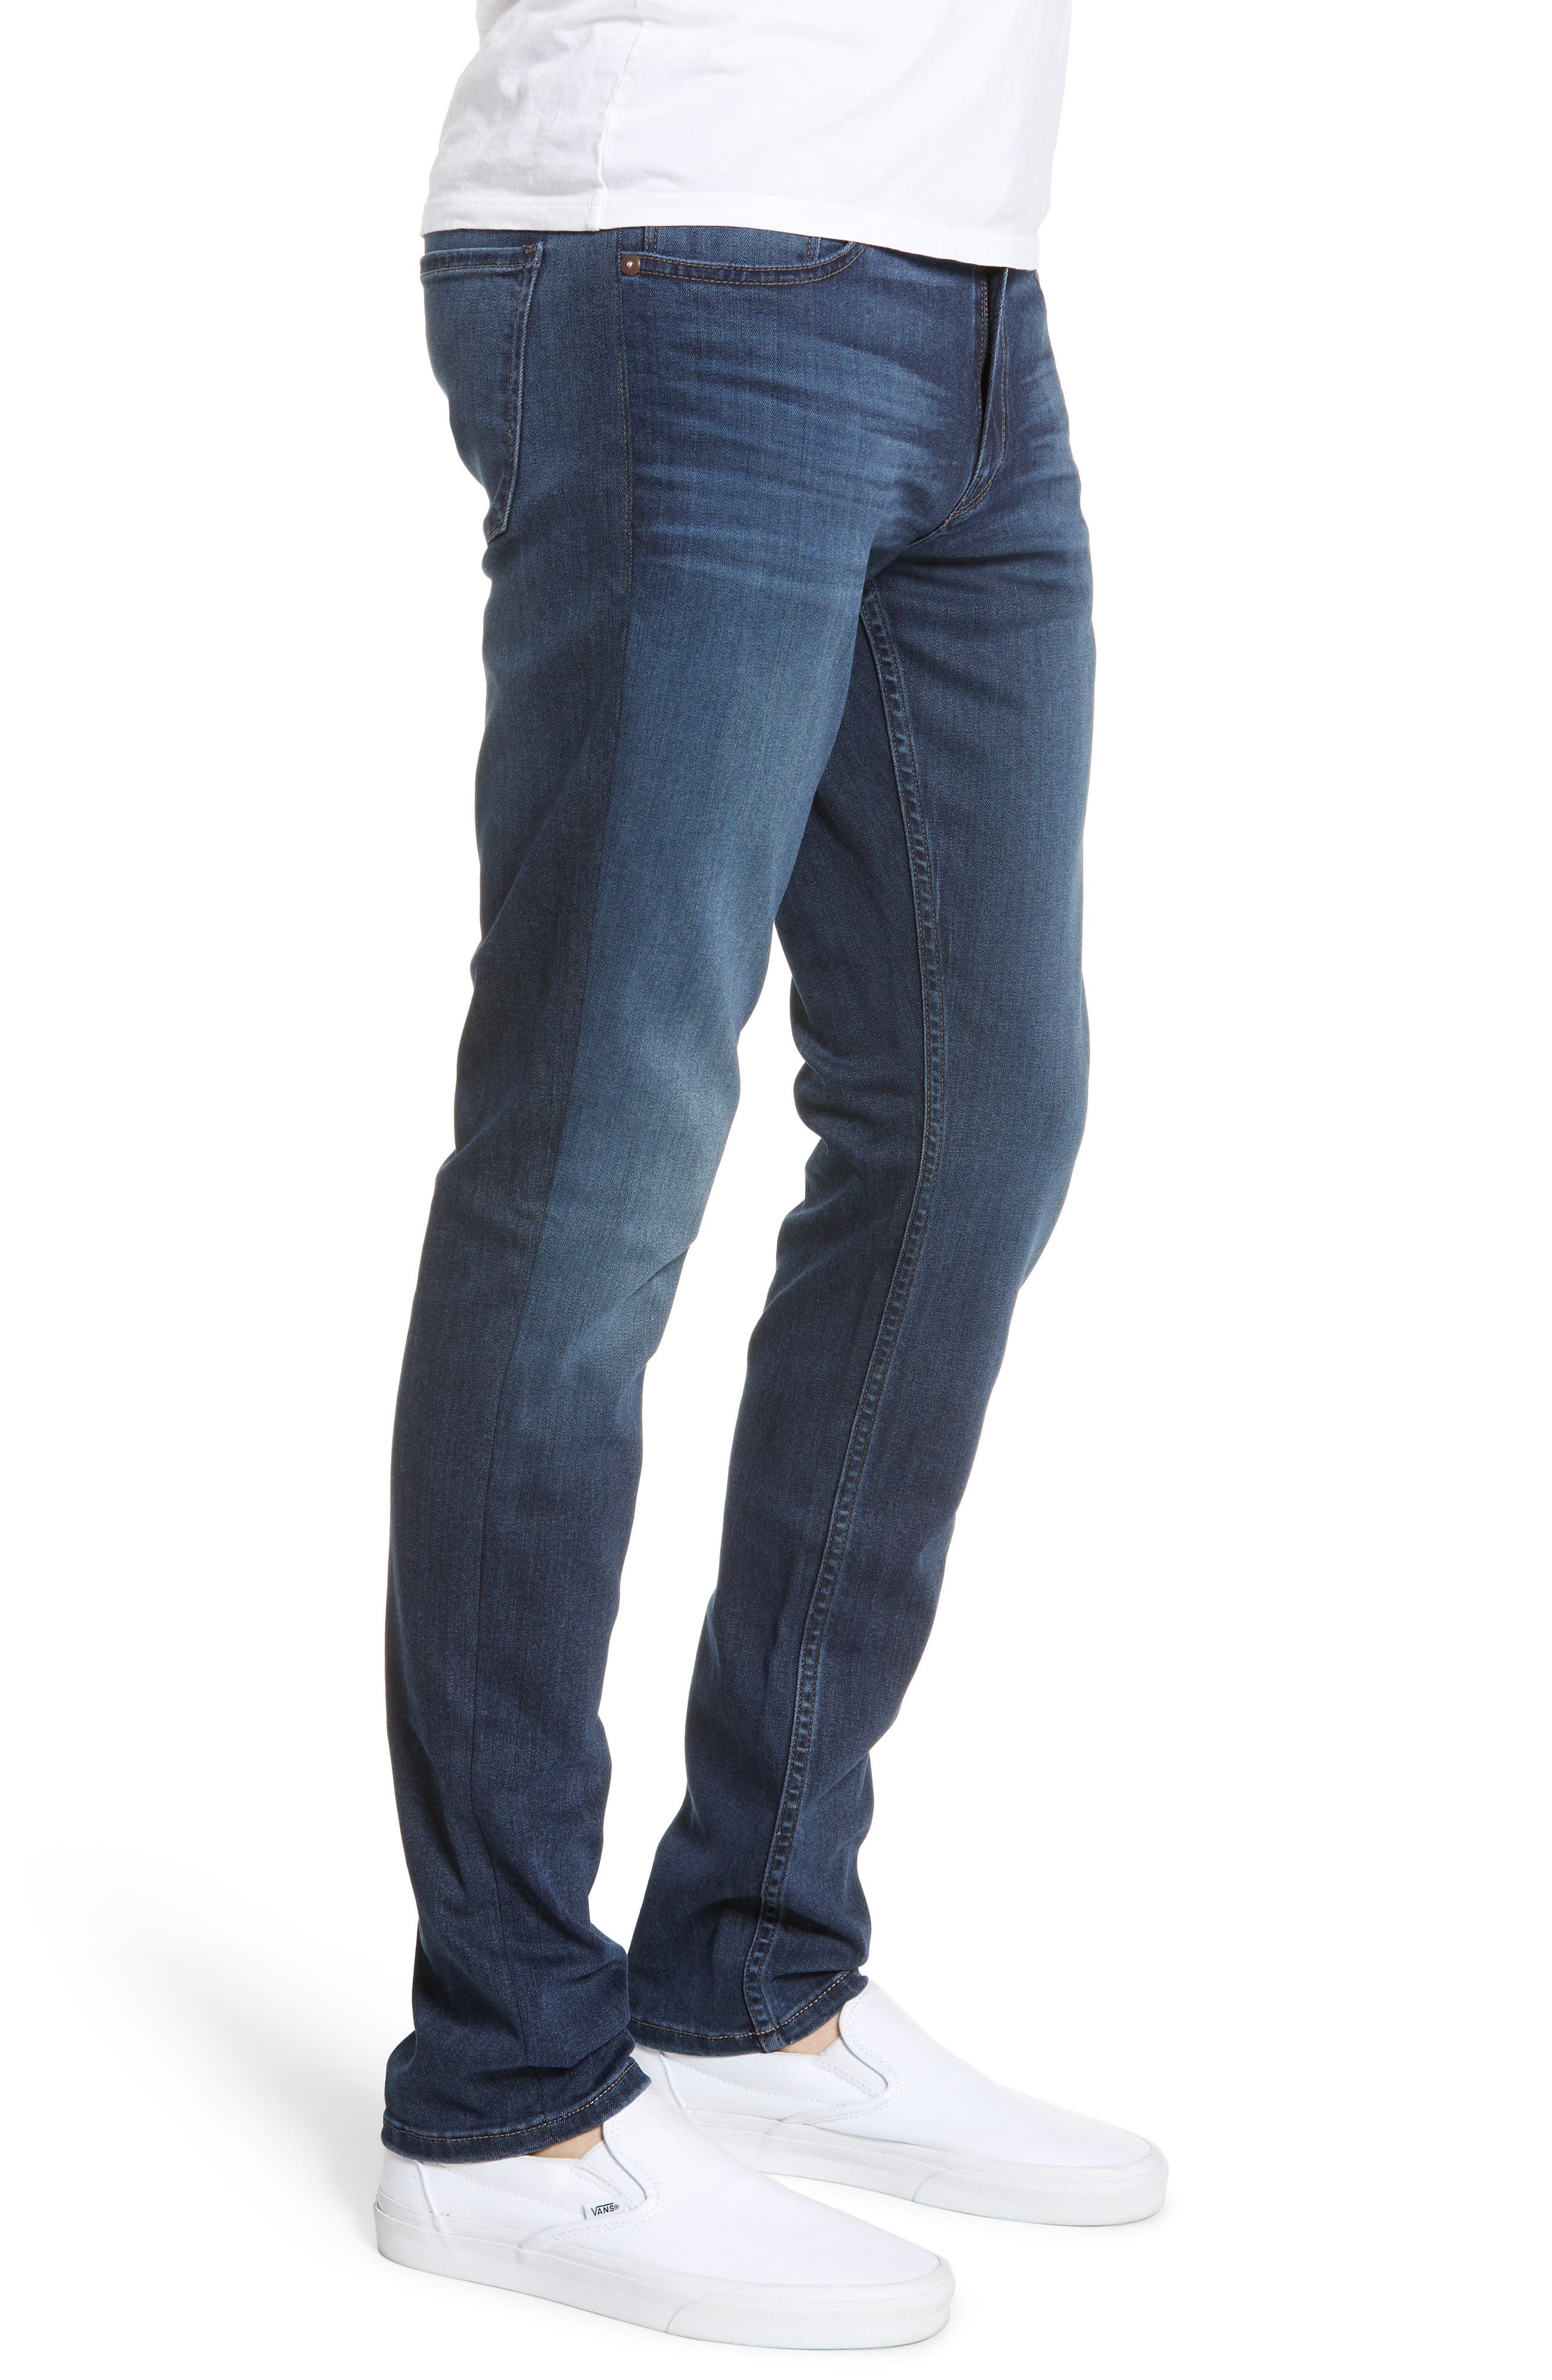 Transcend - Croft Skinny Fit Jeans,                             Alternate thumbnail 3, color,                             HUXLEY